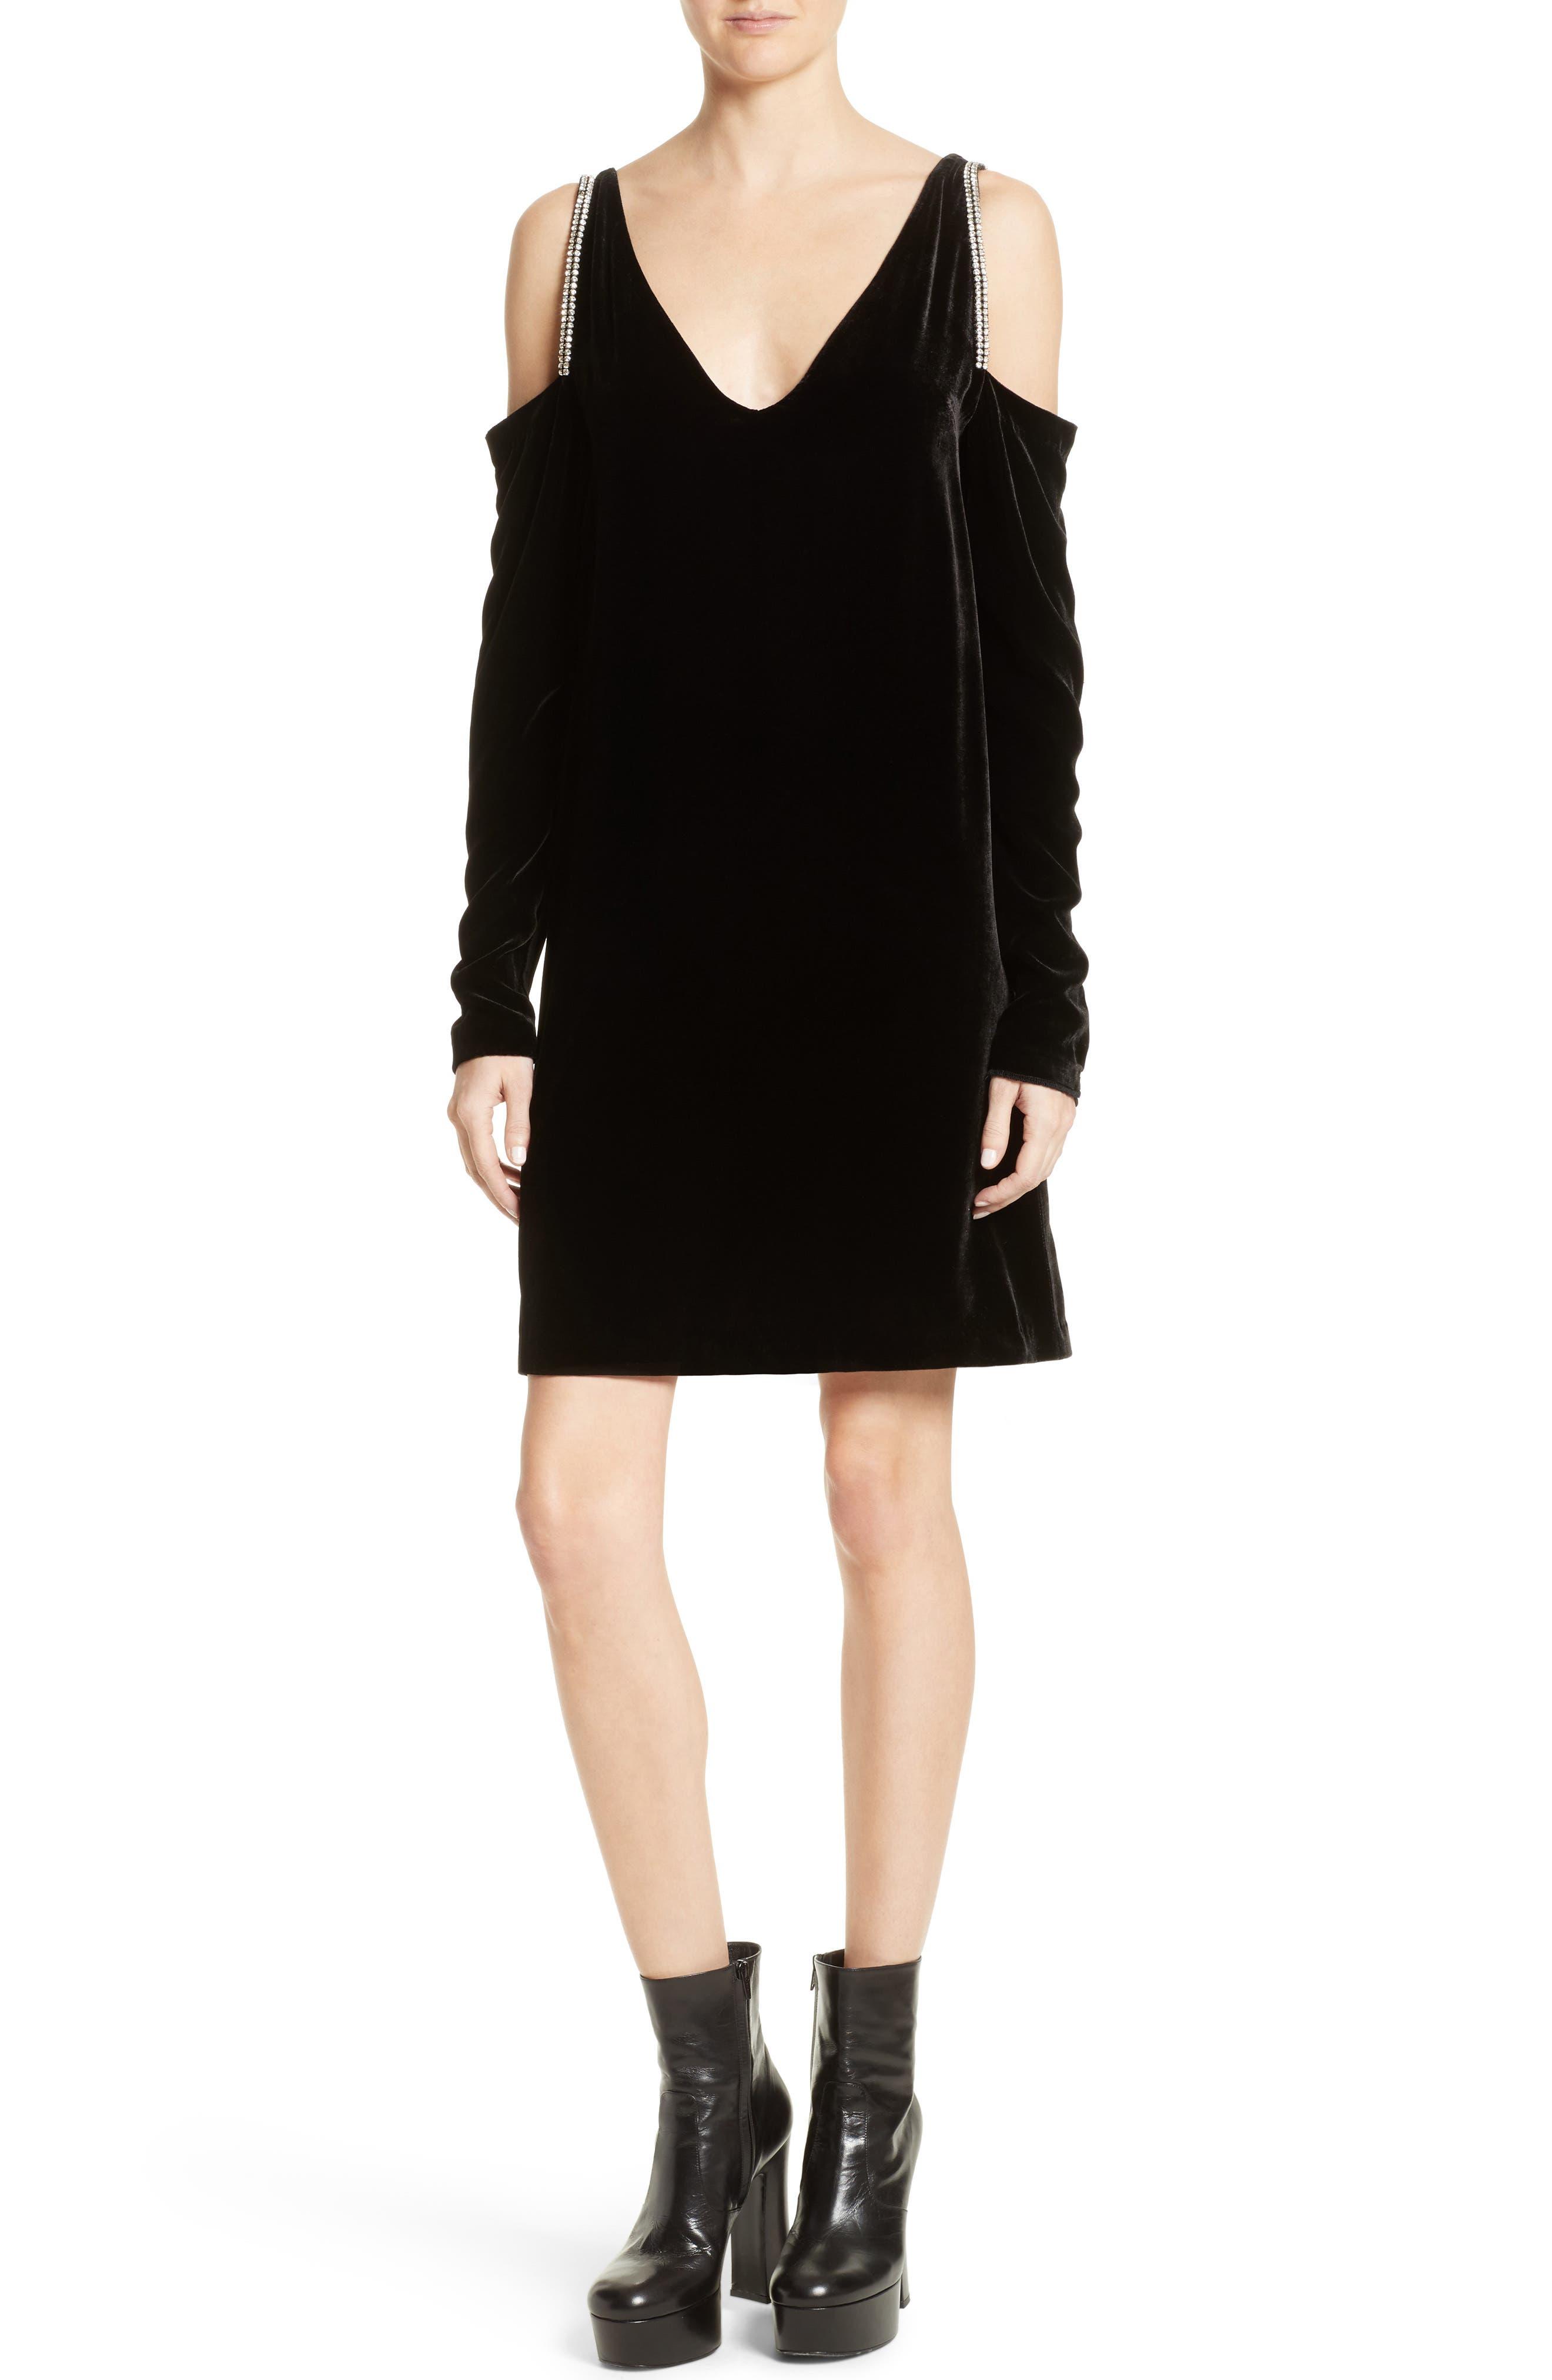 Alternate Image 1 Selected - McQ Alexander McQueen Diam Velvet Cold Shoulder Dress